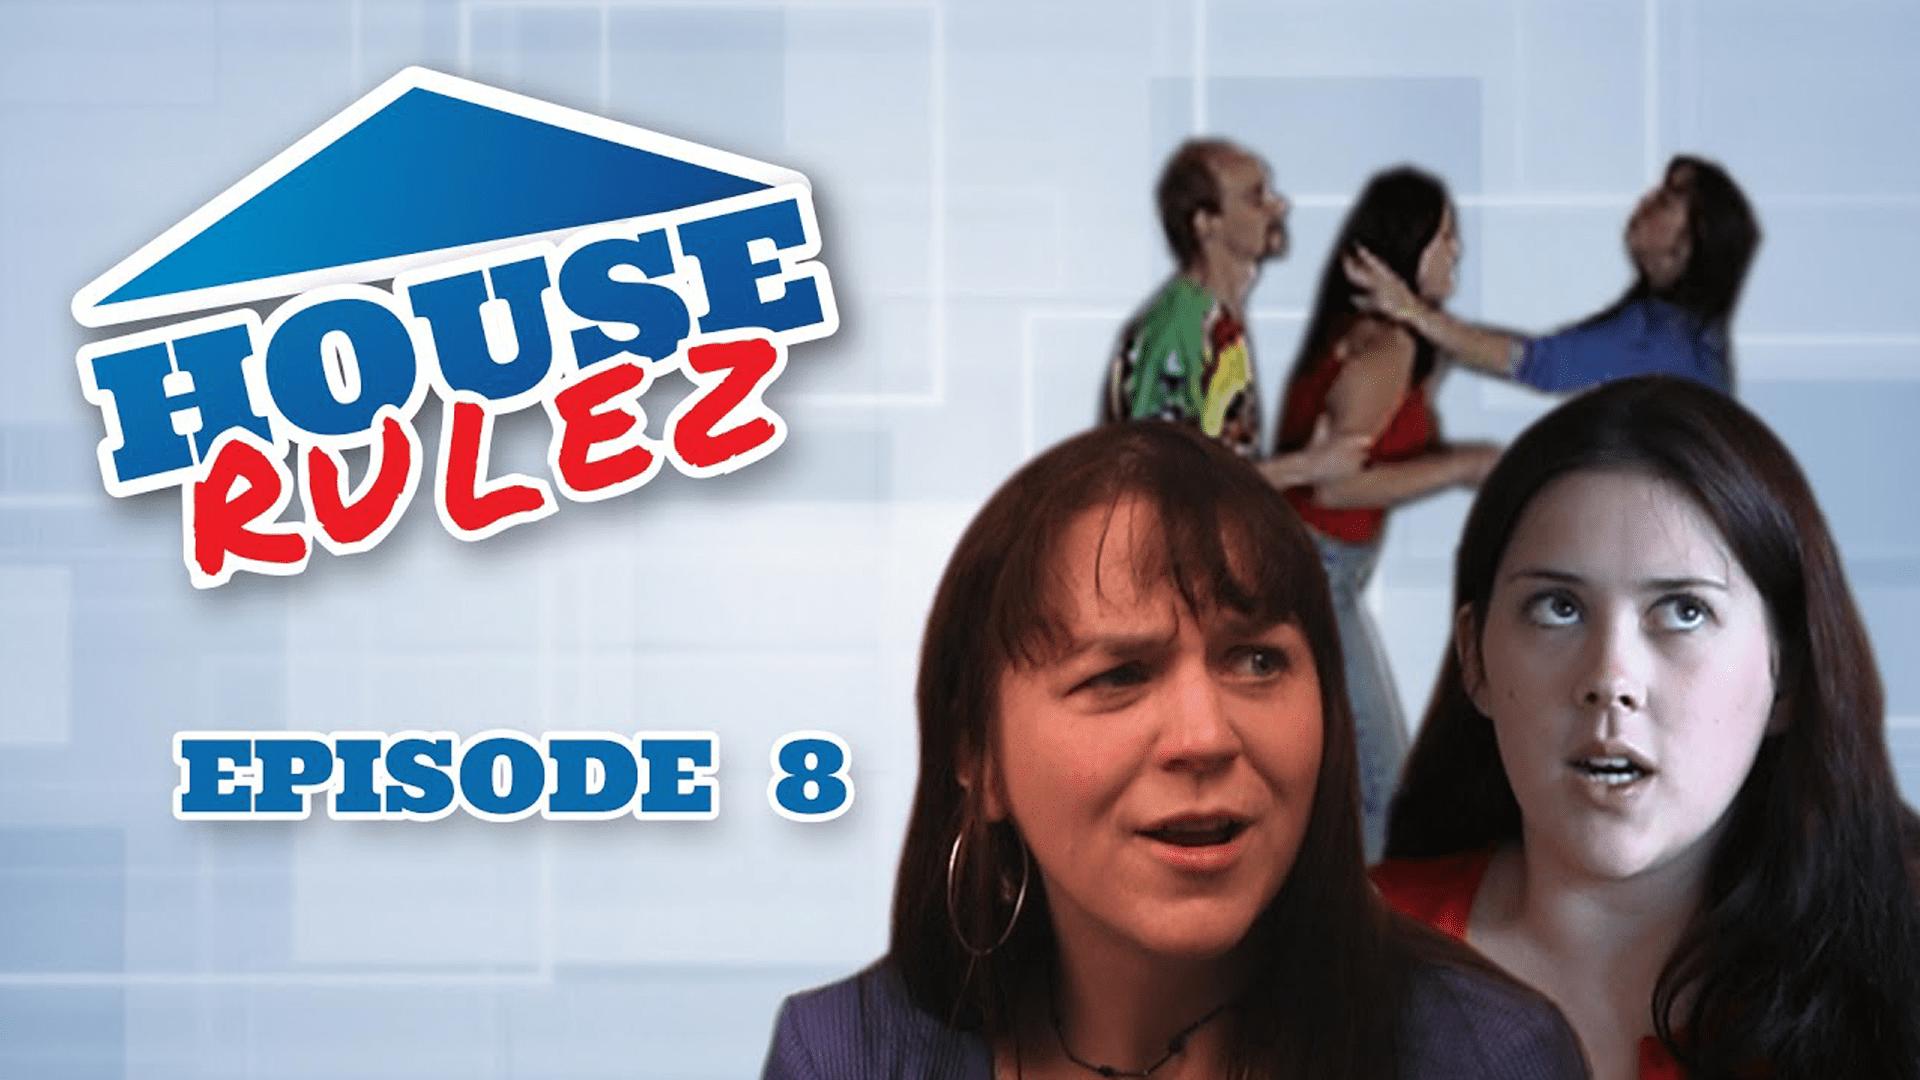 House Rulez Episode 8